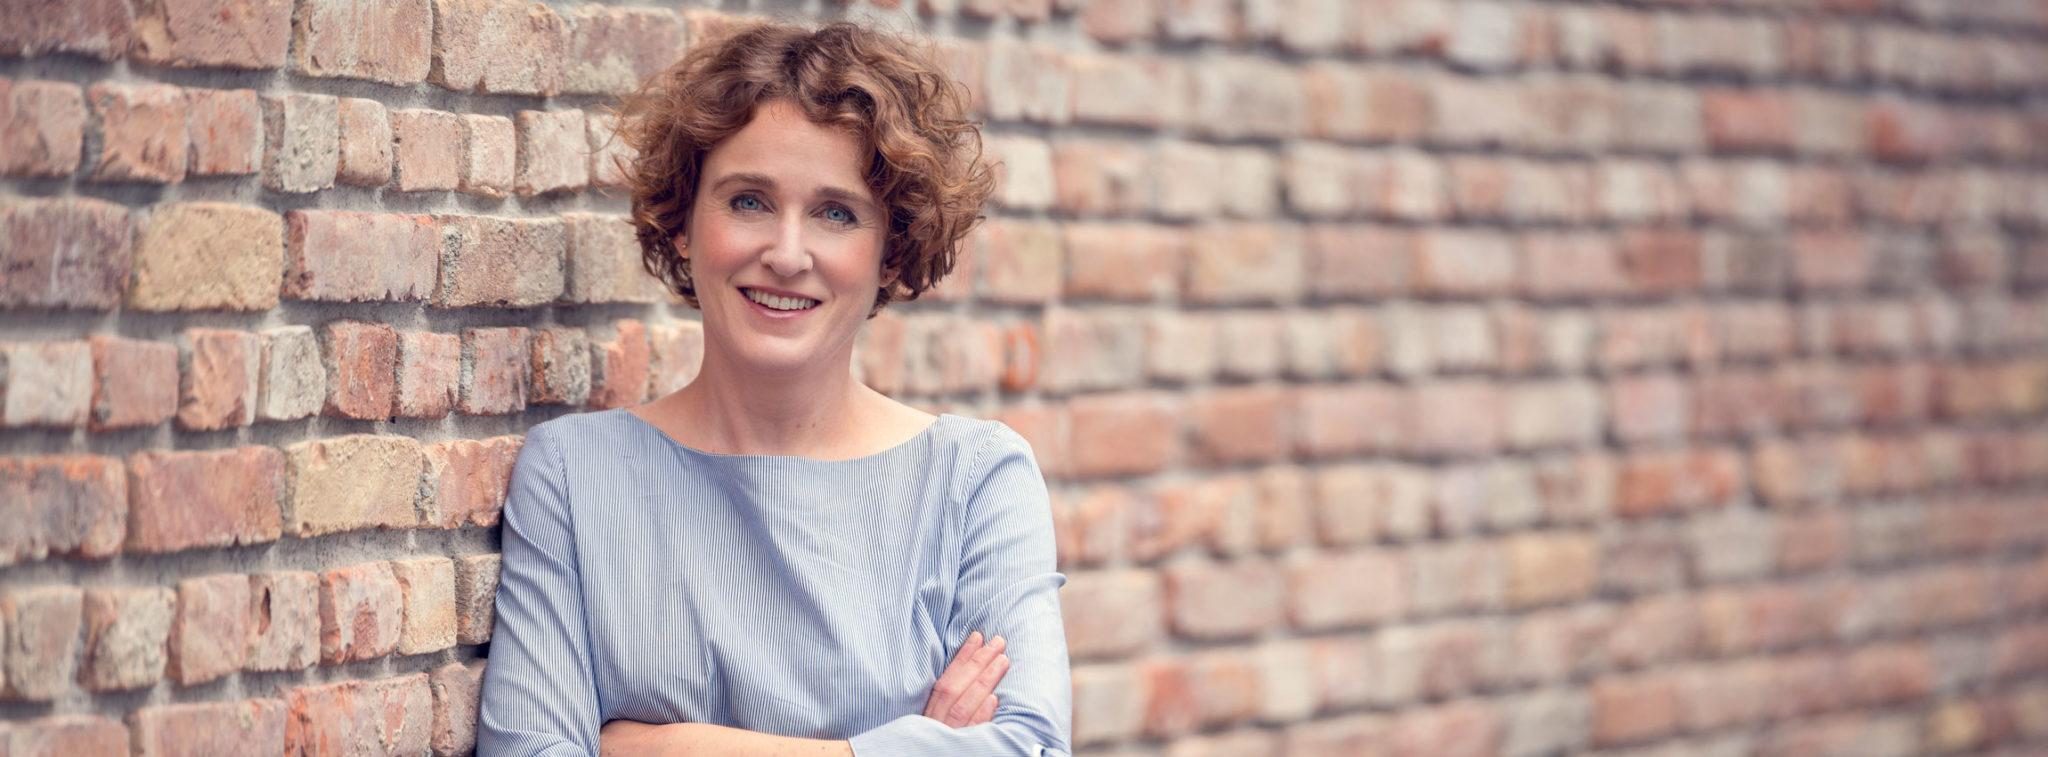 Rechtsanwältin Christina Klapprott als Anwalt in Bad Aibling